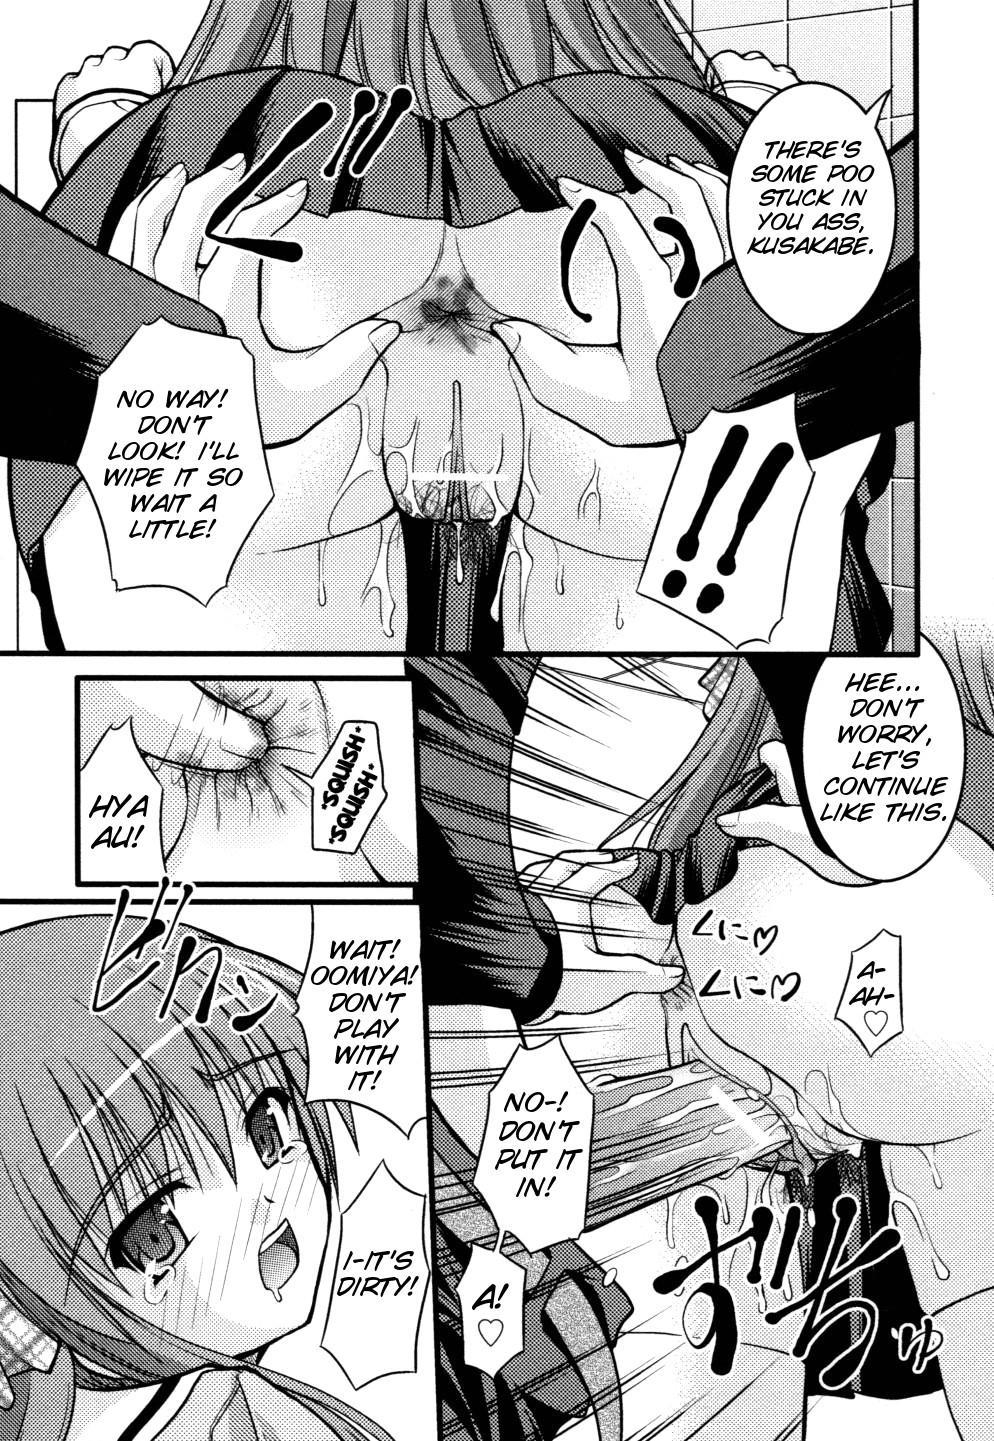 [Anthology Nozoite wa Ikenai 3](do not peep 3) ep4 [Satomi Hidefumi] - The Catcher in The Girl's Room(Eng) 16